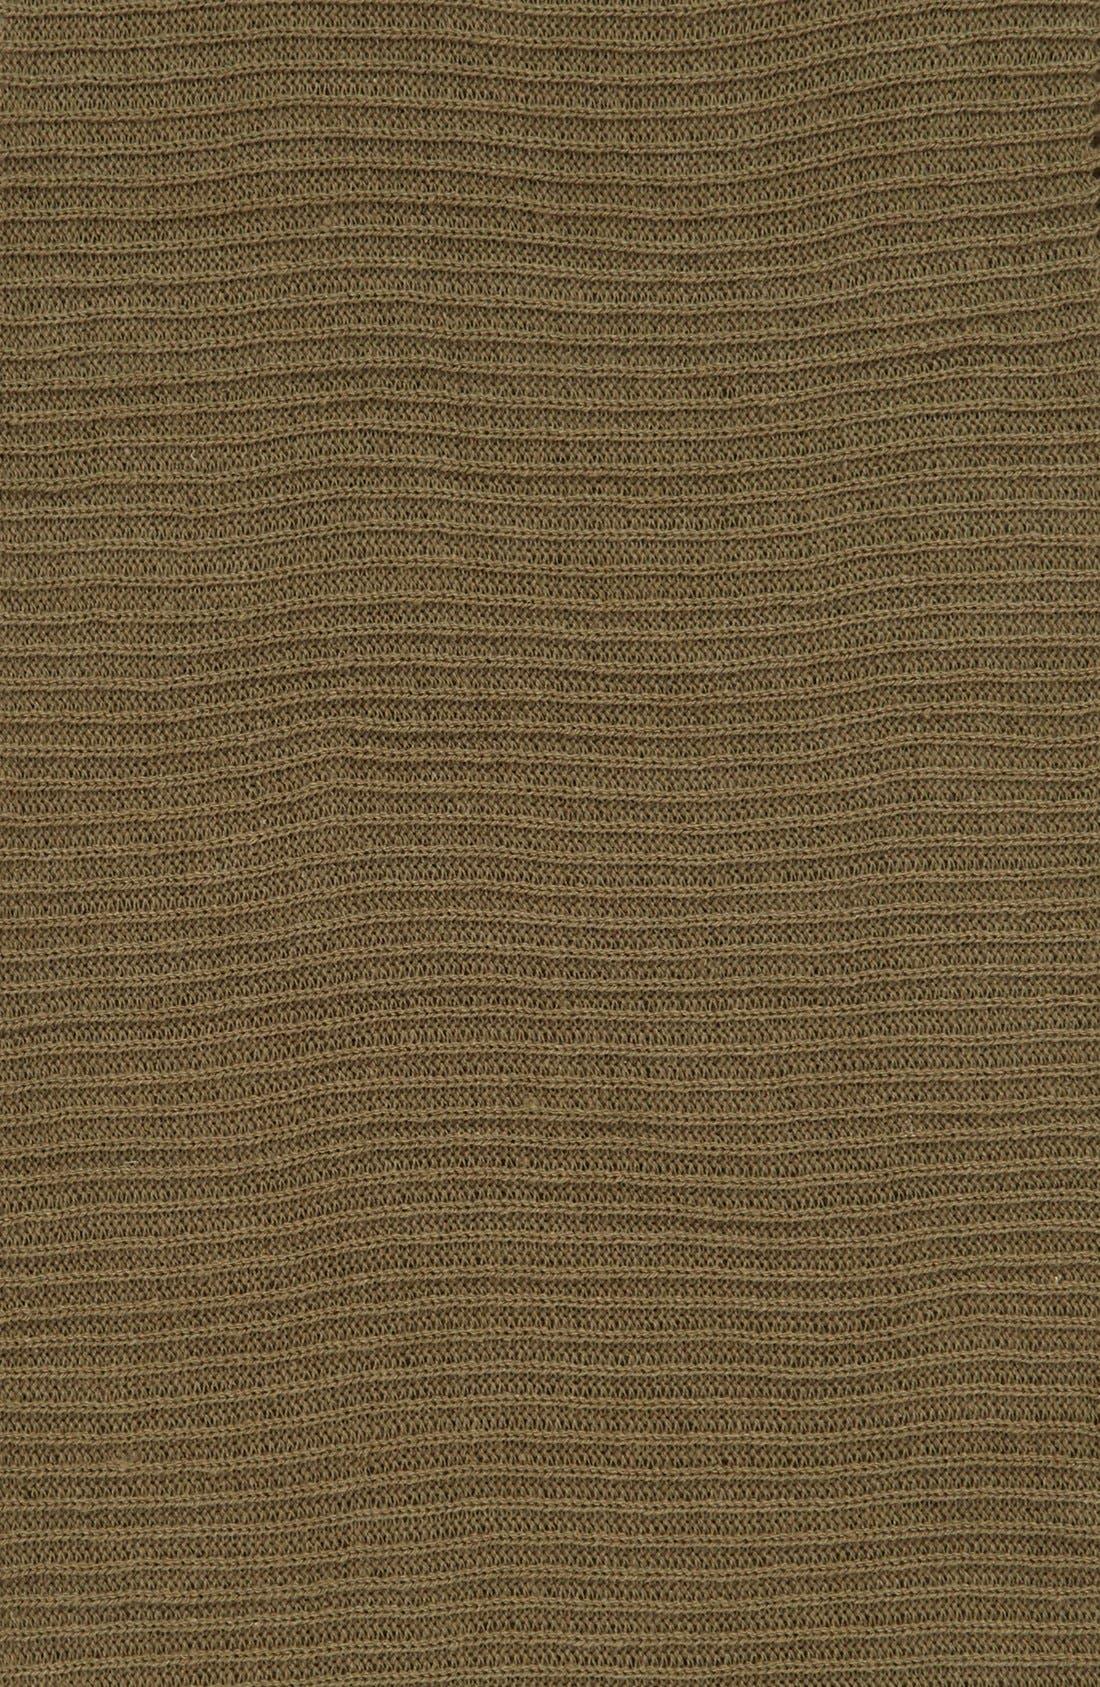 Alternate Image 3  - BP. Rib Knit Fringe Infinity Scarf